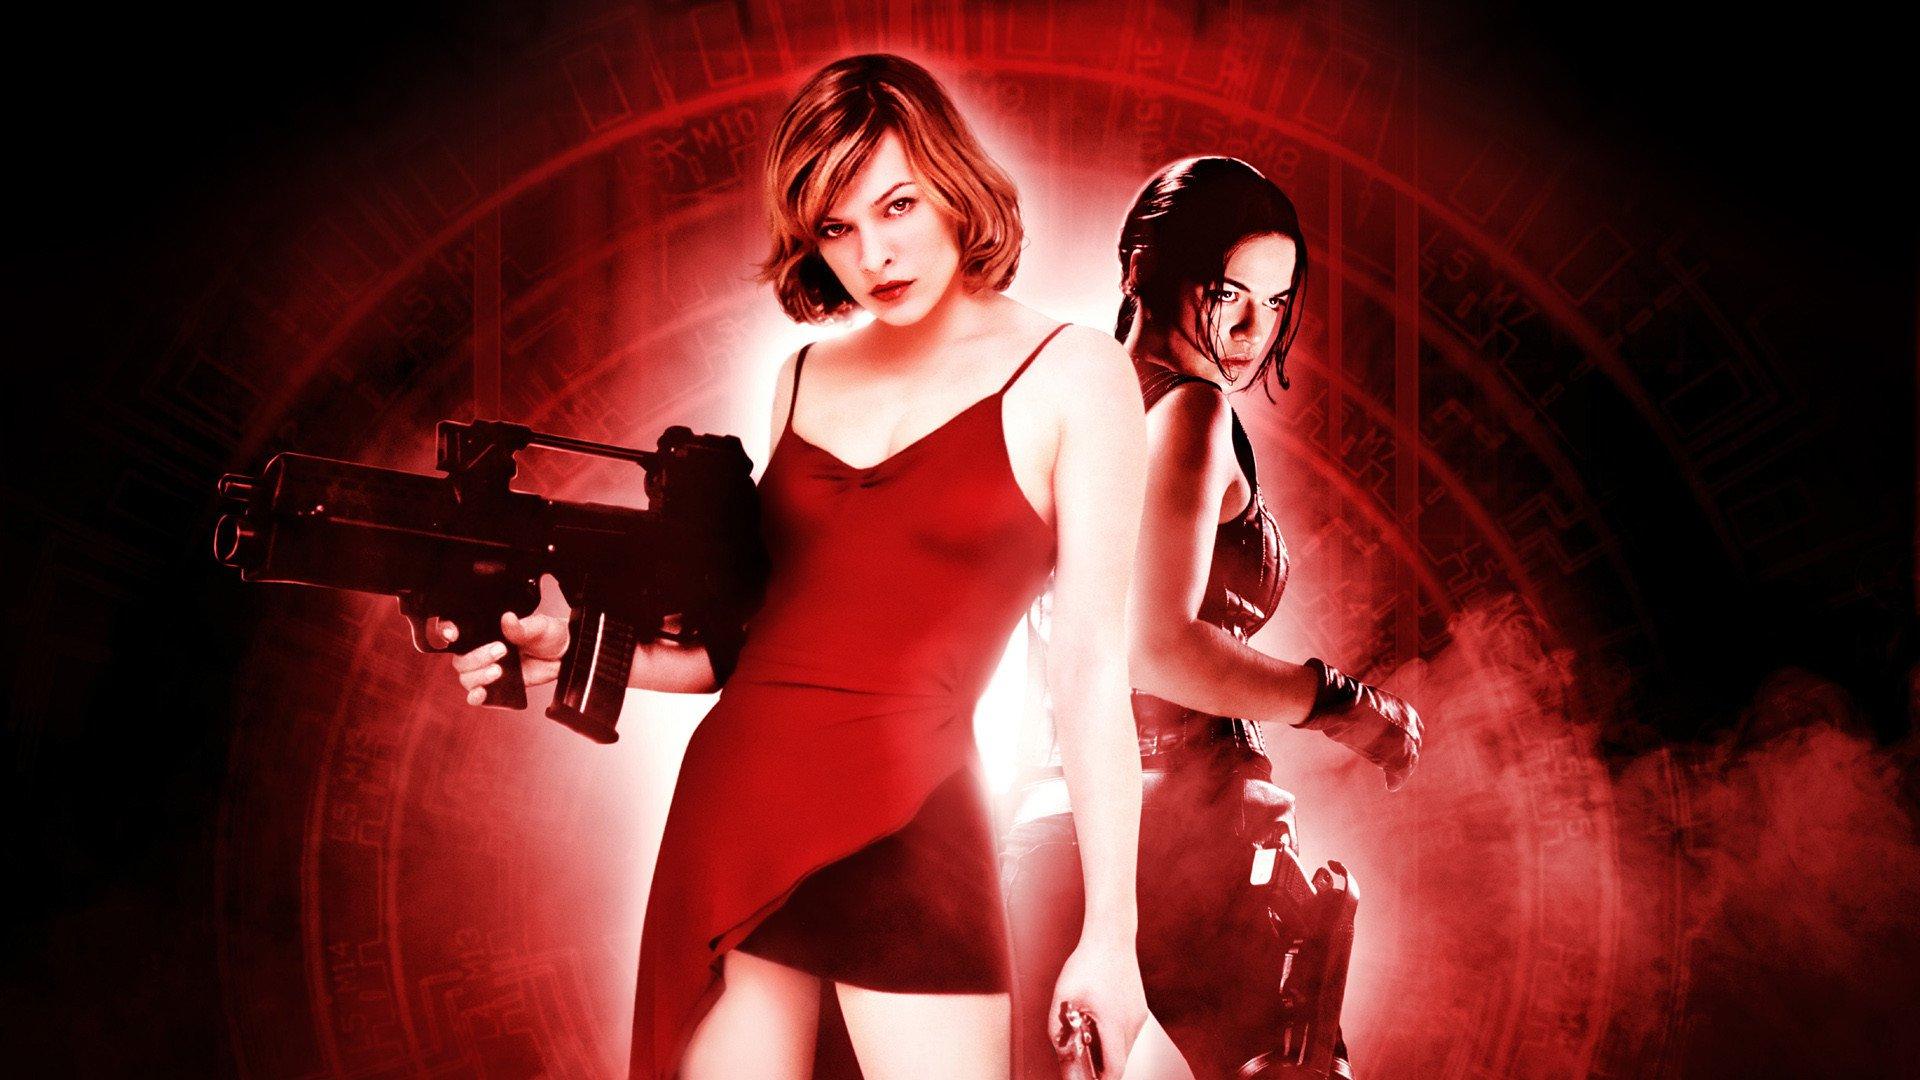 resident evil movies - 800×600